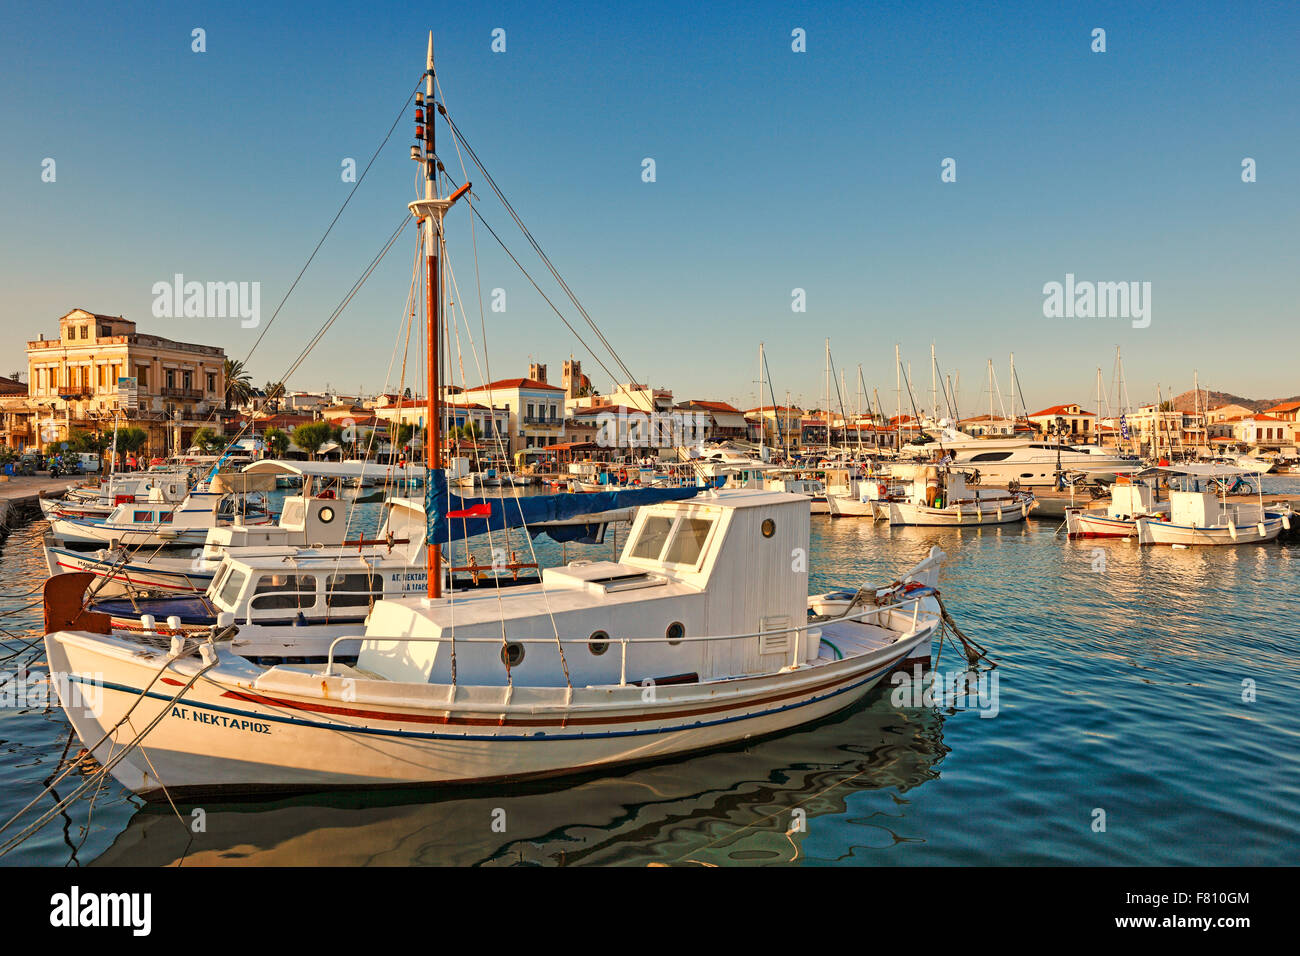 Bateaux du port d'Aegina island, Grèce Photo Stock